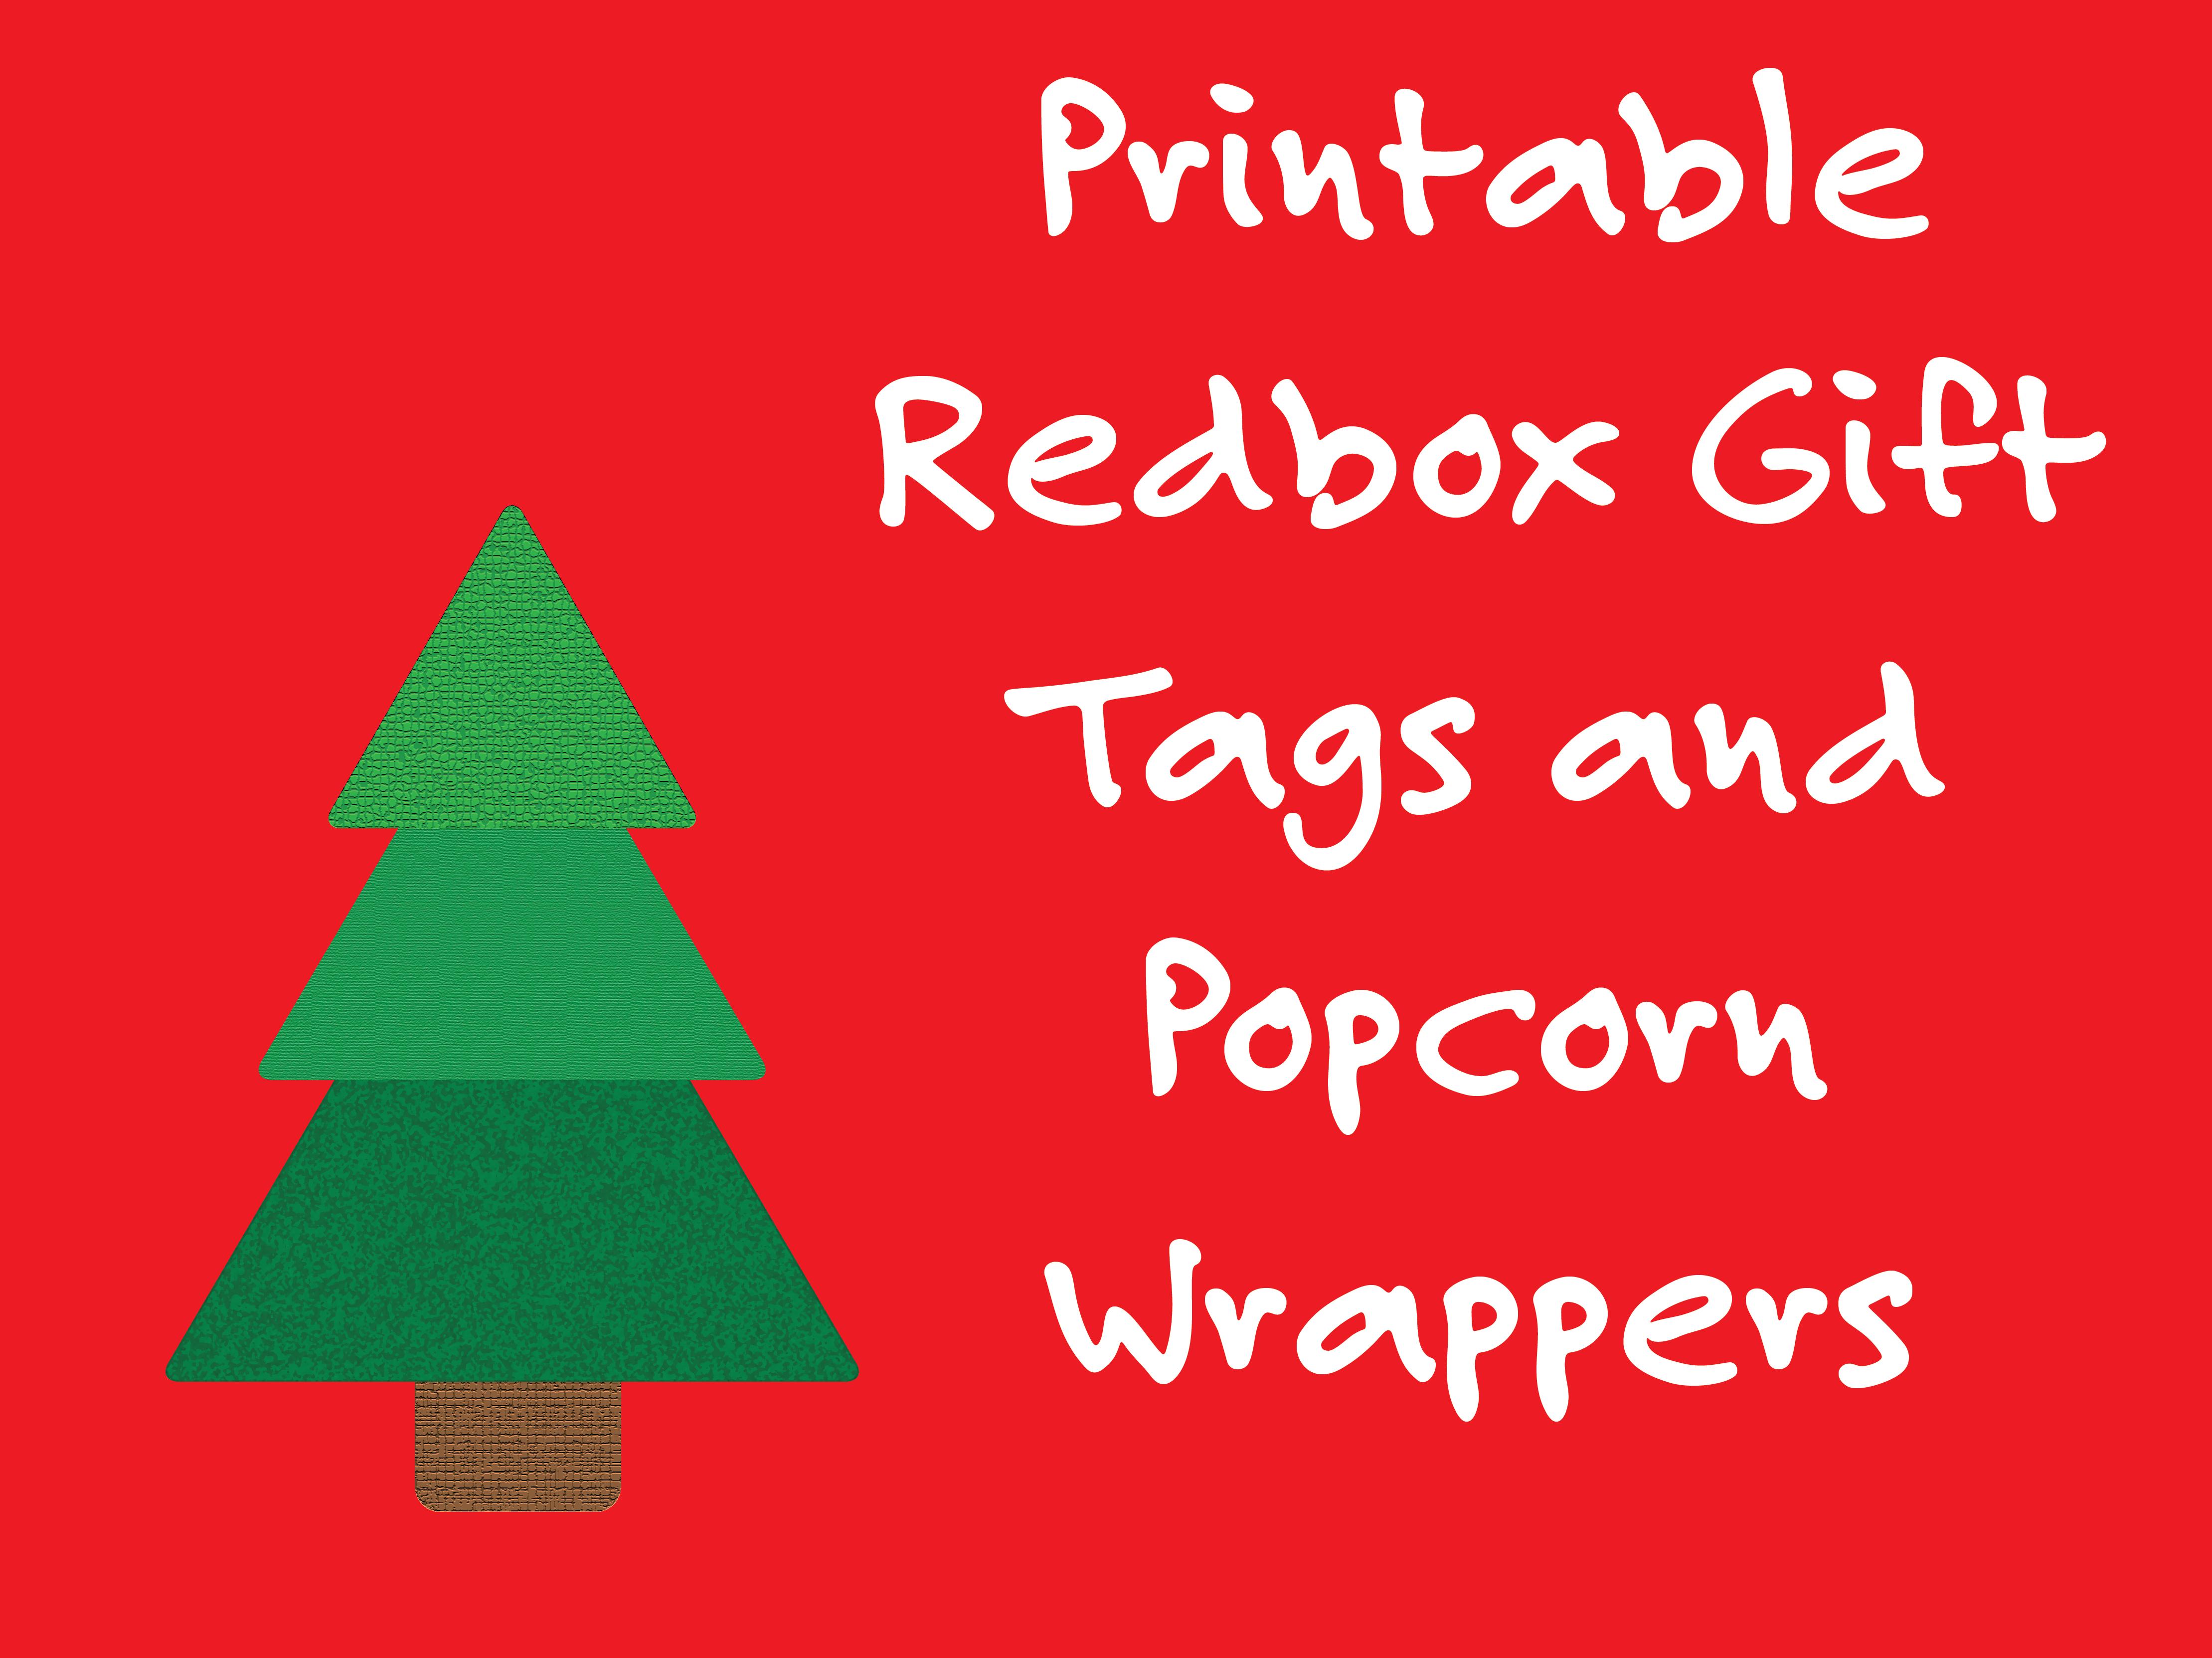 Printable Redbox Gift Tags And Popcorn Wrappers – Deeper Kidmin - Free Printable Redbox Gift Tags